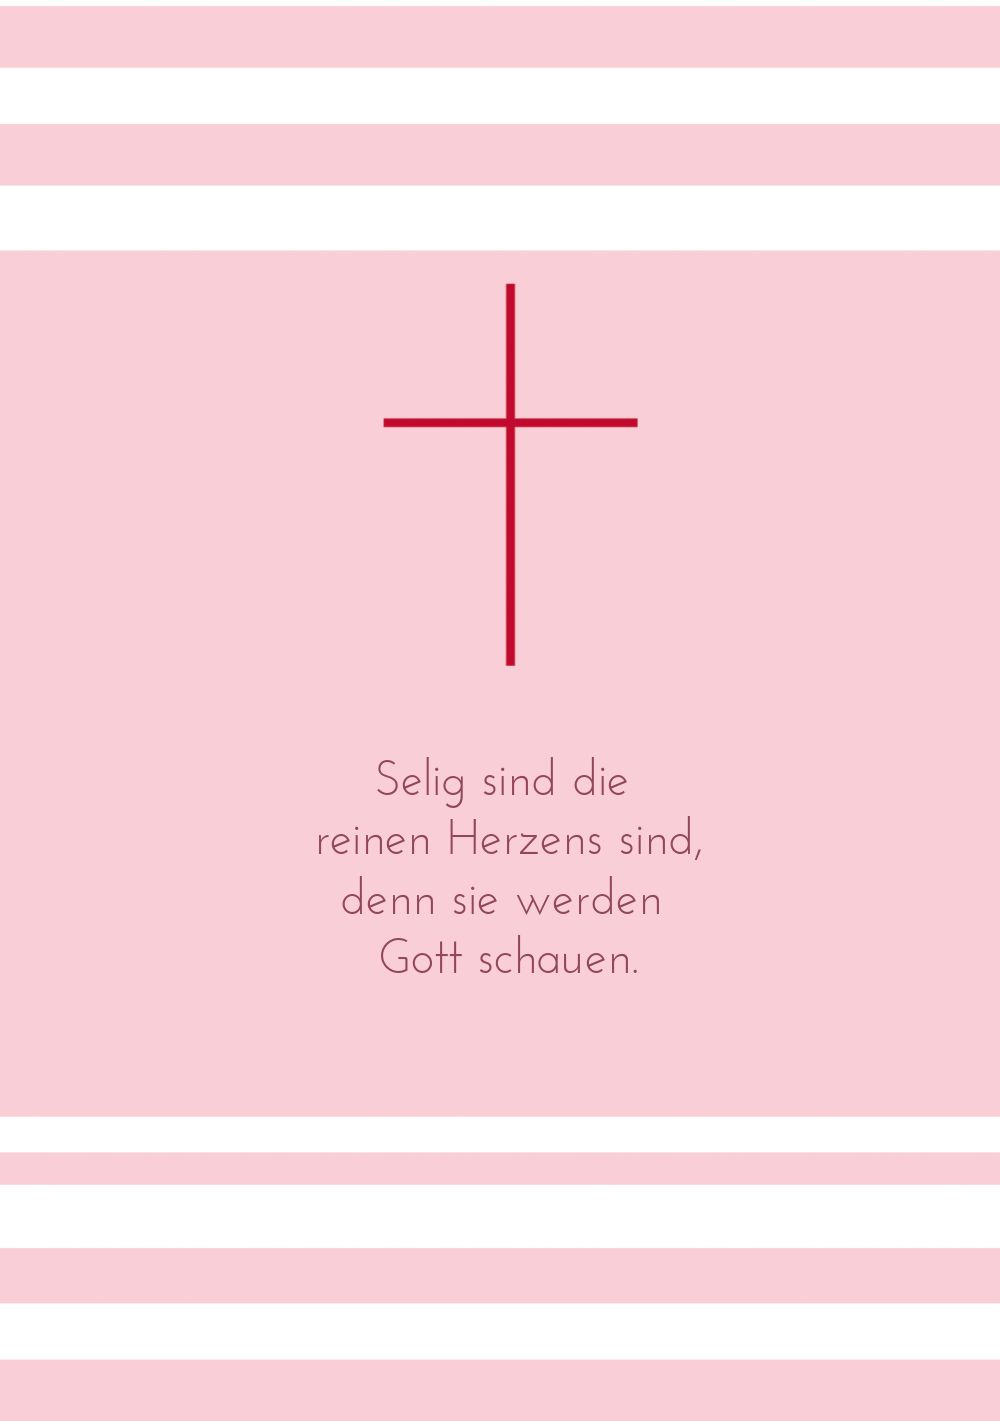 Ansicht 4 - Kommunion Dankeskarte Kreuz